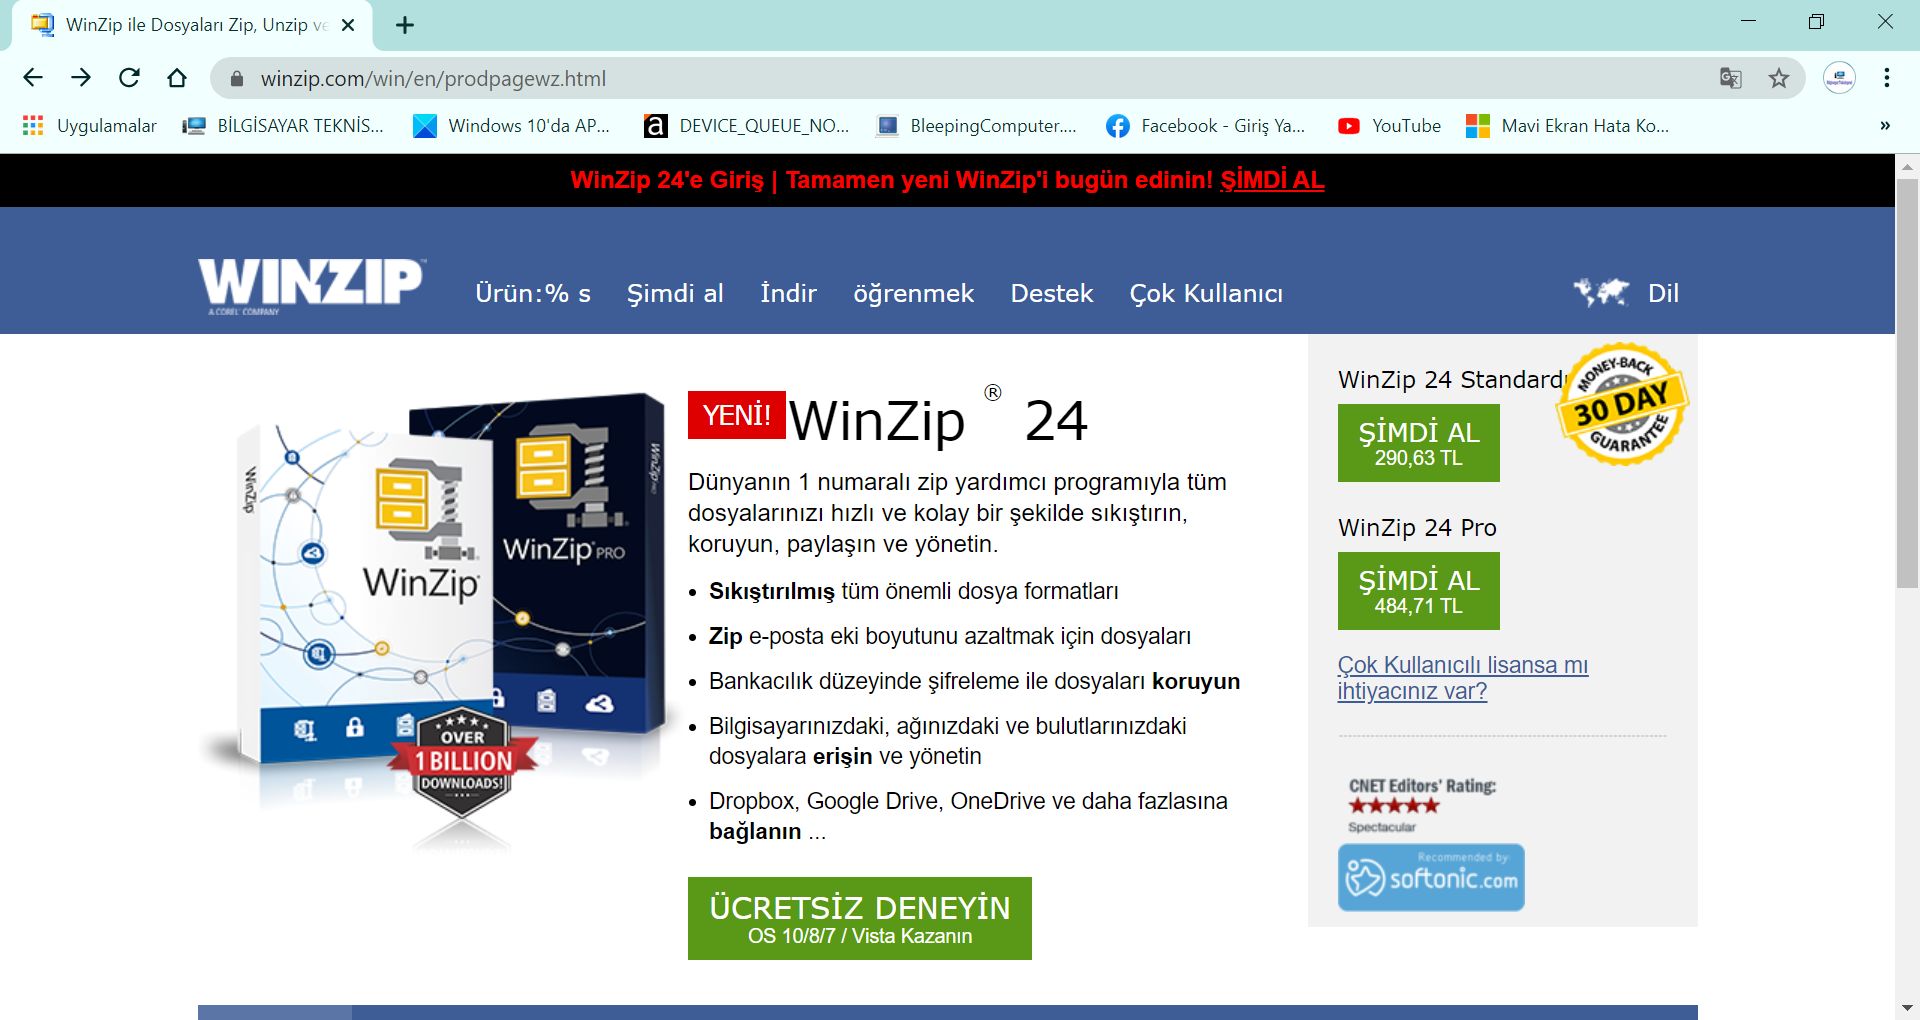 WinZip Web Sitesi